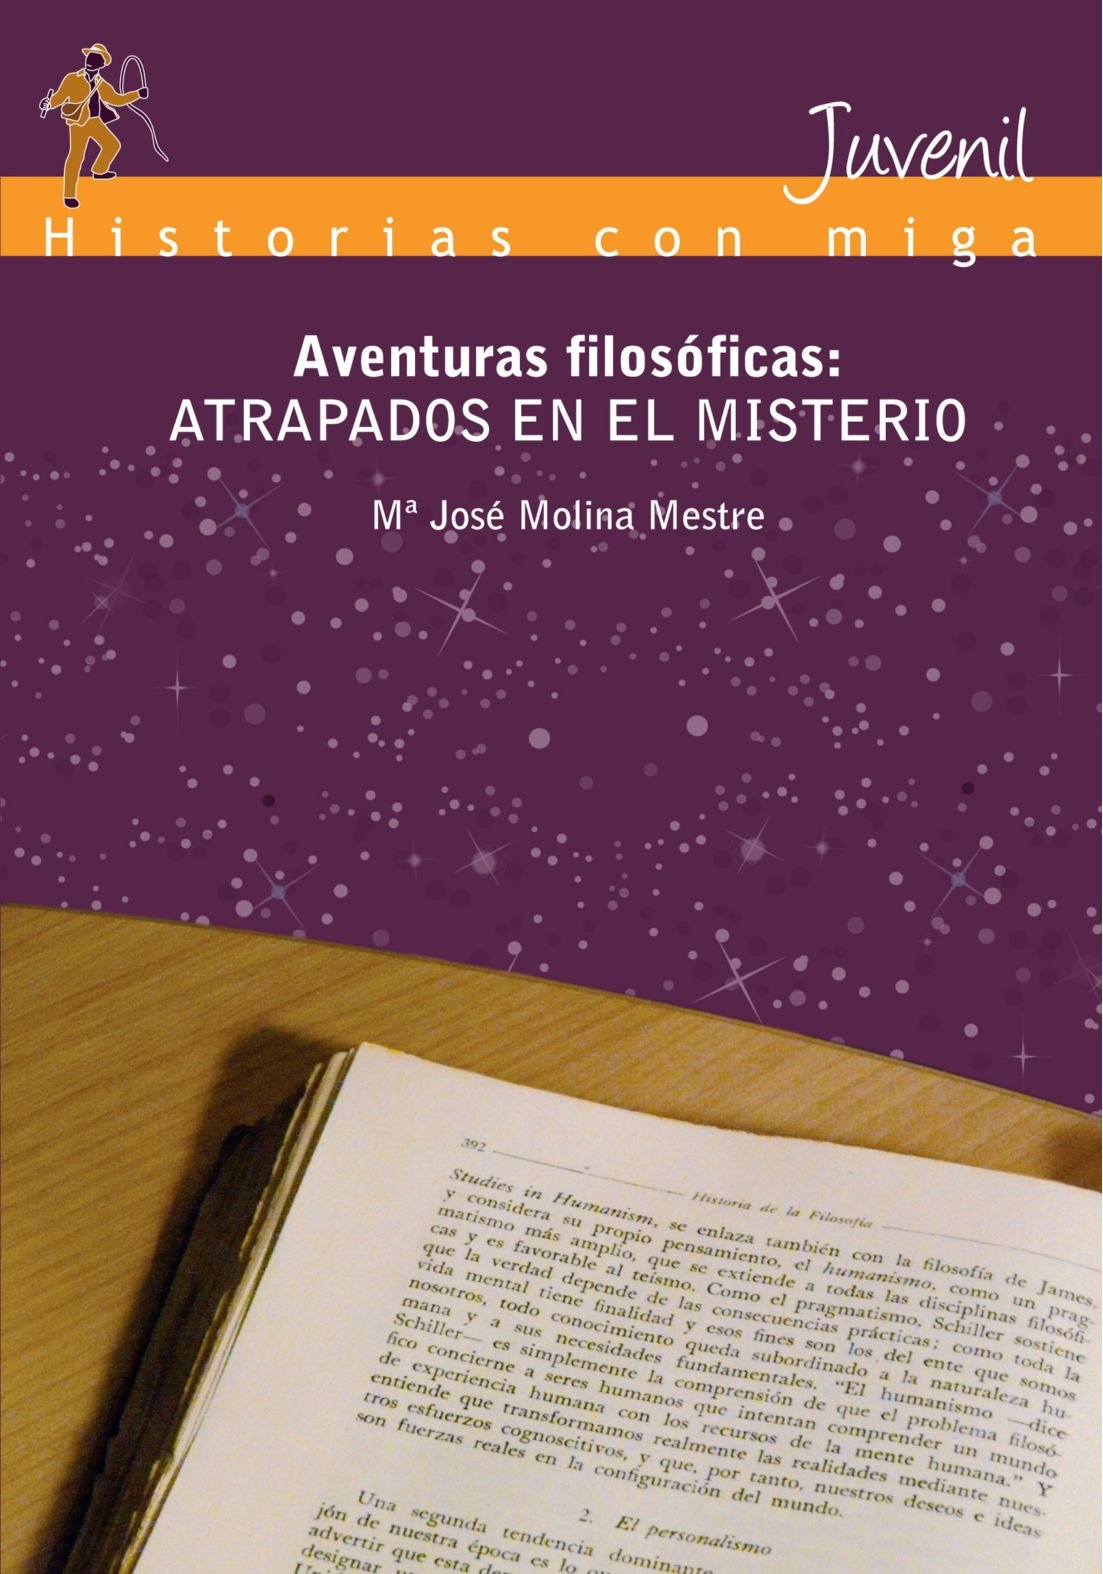 Aventuras Filosóficas: Atrapados en el Misterio (Spanish Edition) (Spanish) Paperback – January 20, 2010